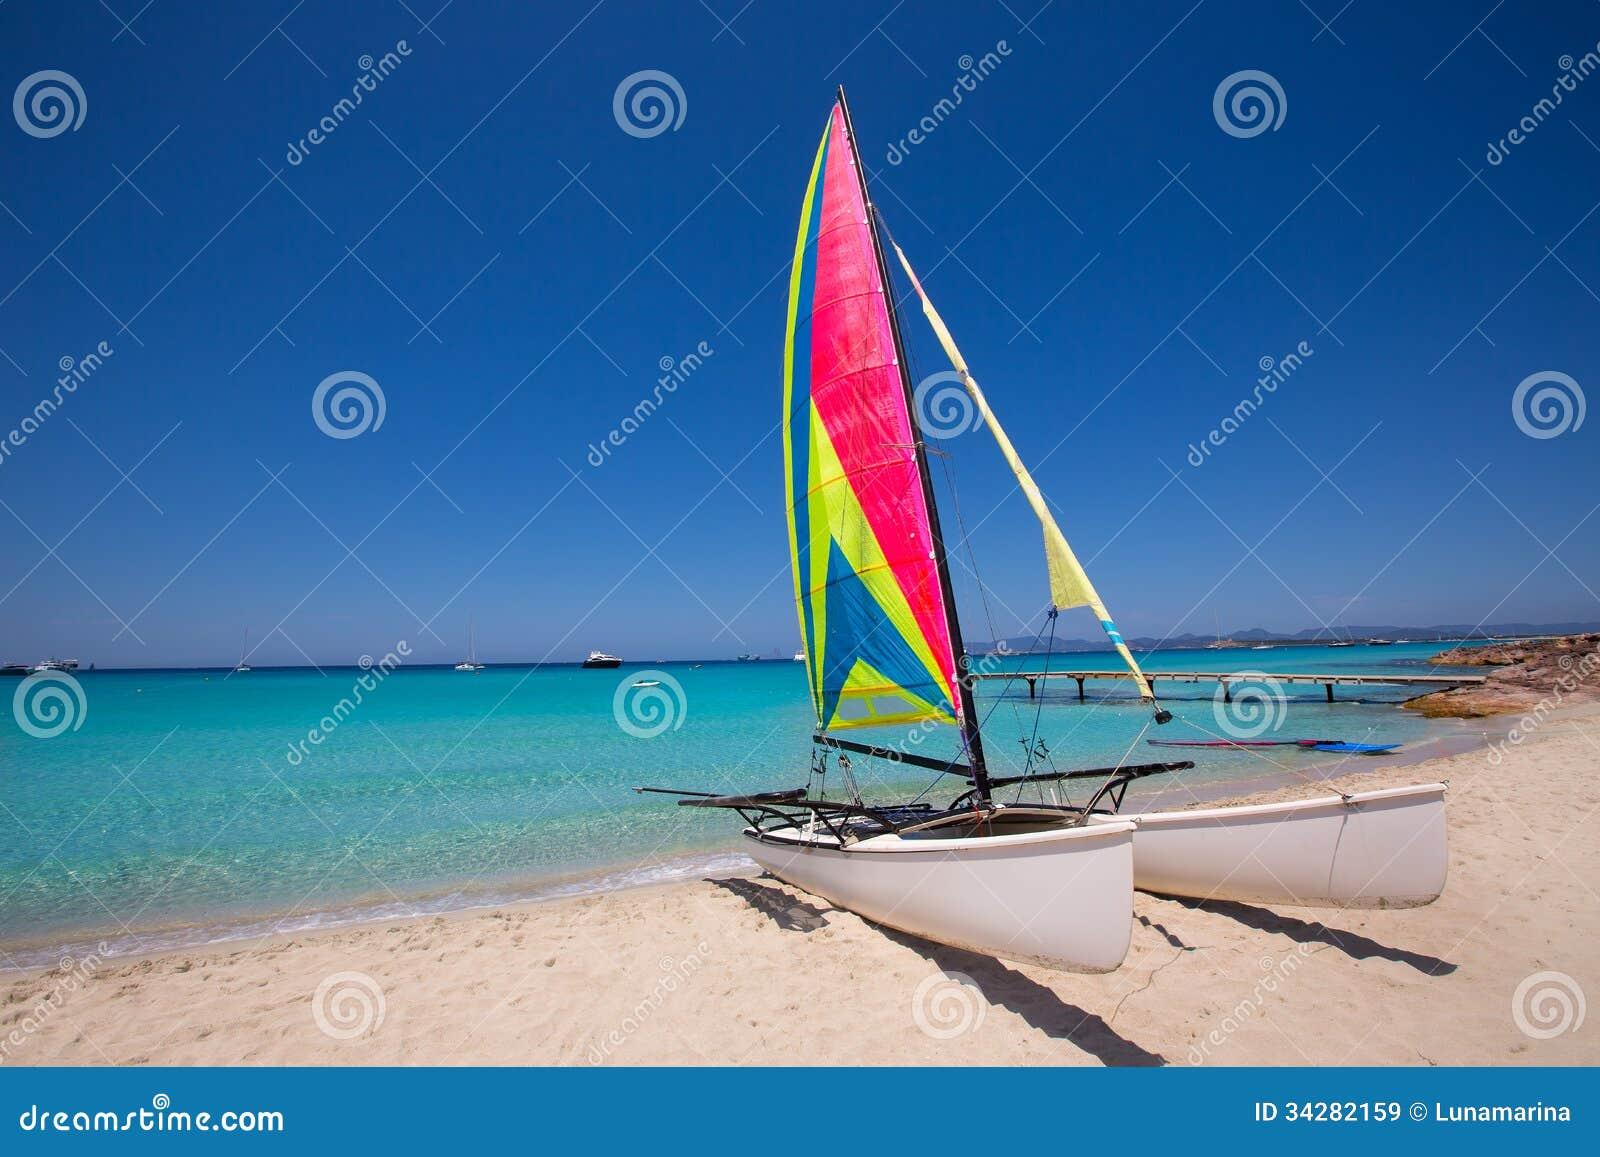 Catamaran Sailboat In Illetes Beach Of Formentera Royalty Free Stock ...